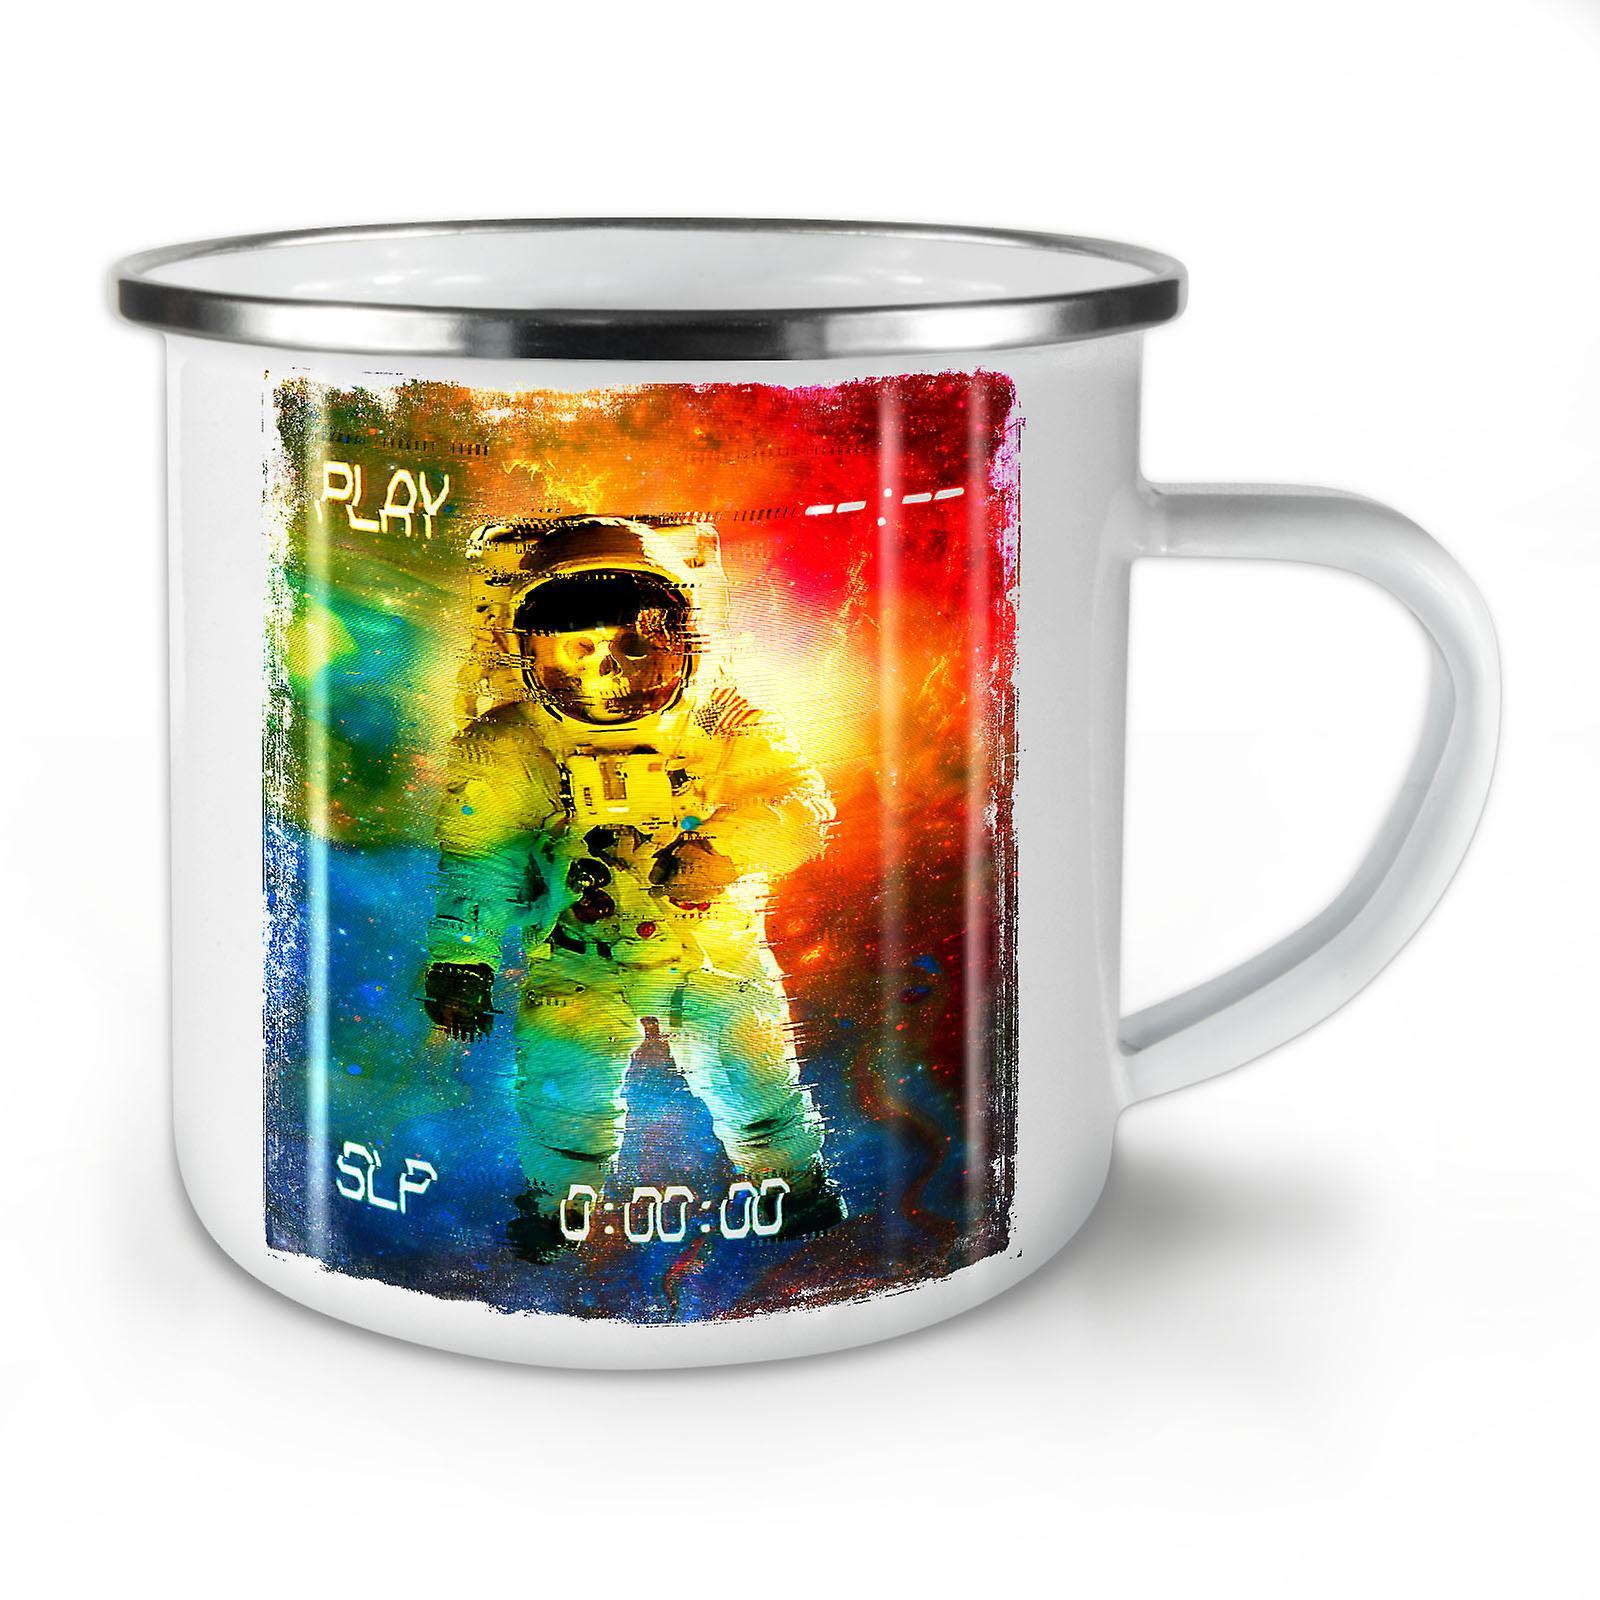 Émail OzWellcoda Espace Whitetea Mug10 Crâne Nouveau Astronaute Café RLq4A5S3jc